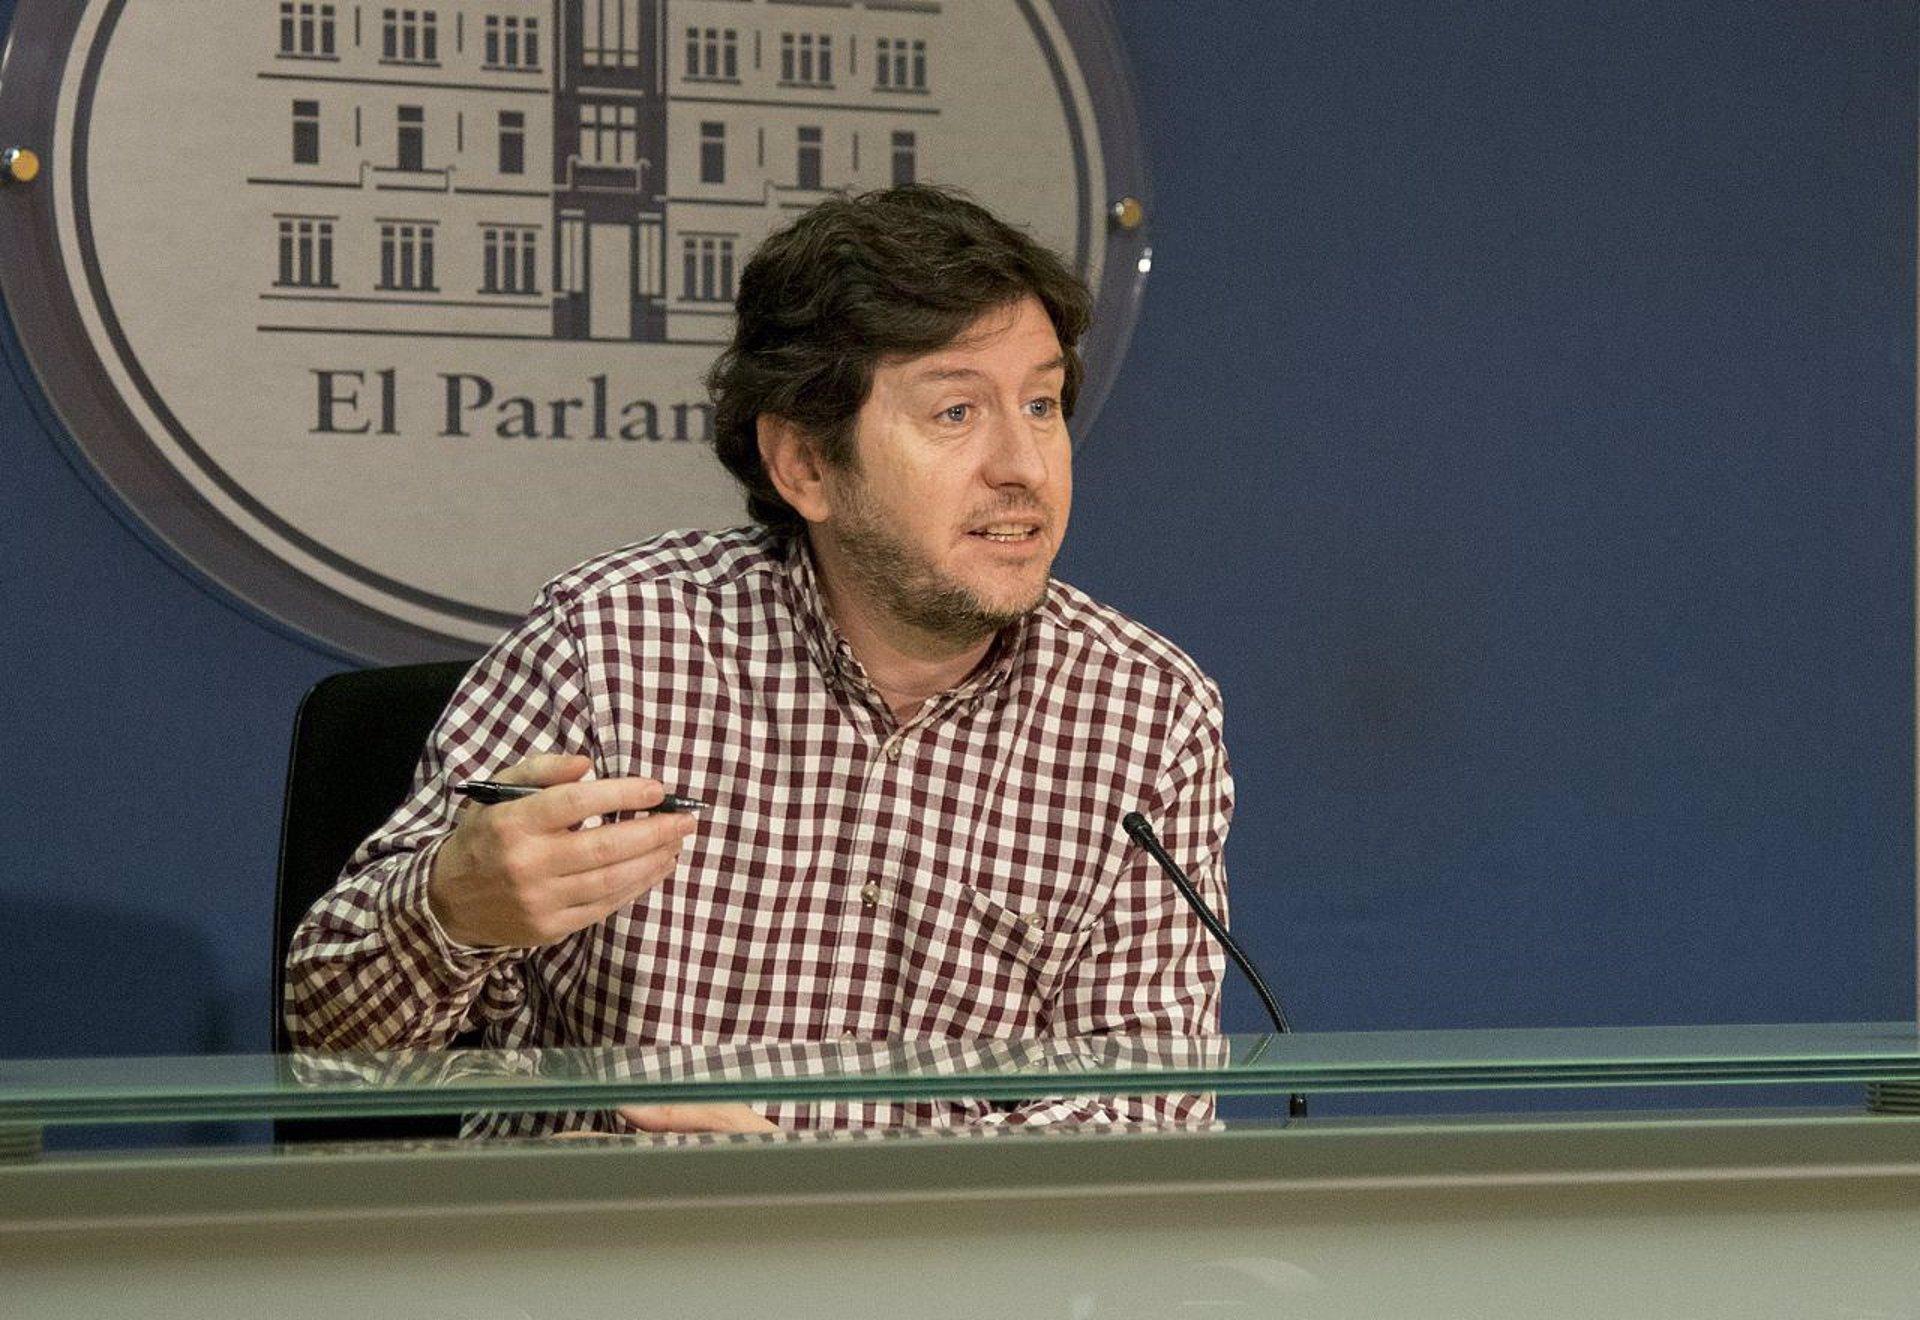 https://img.europapress.es/fotoweb/fotonoticia_20181029115247_1920.jpg